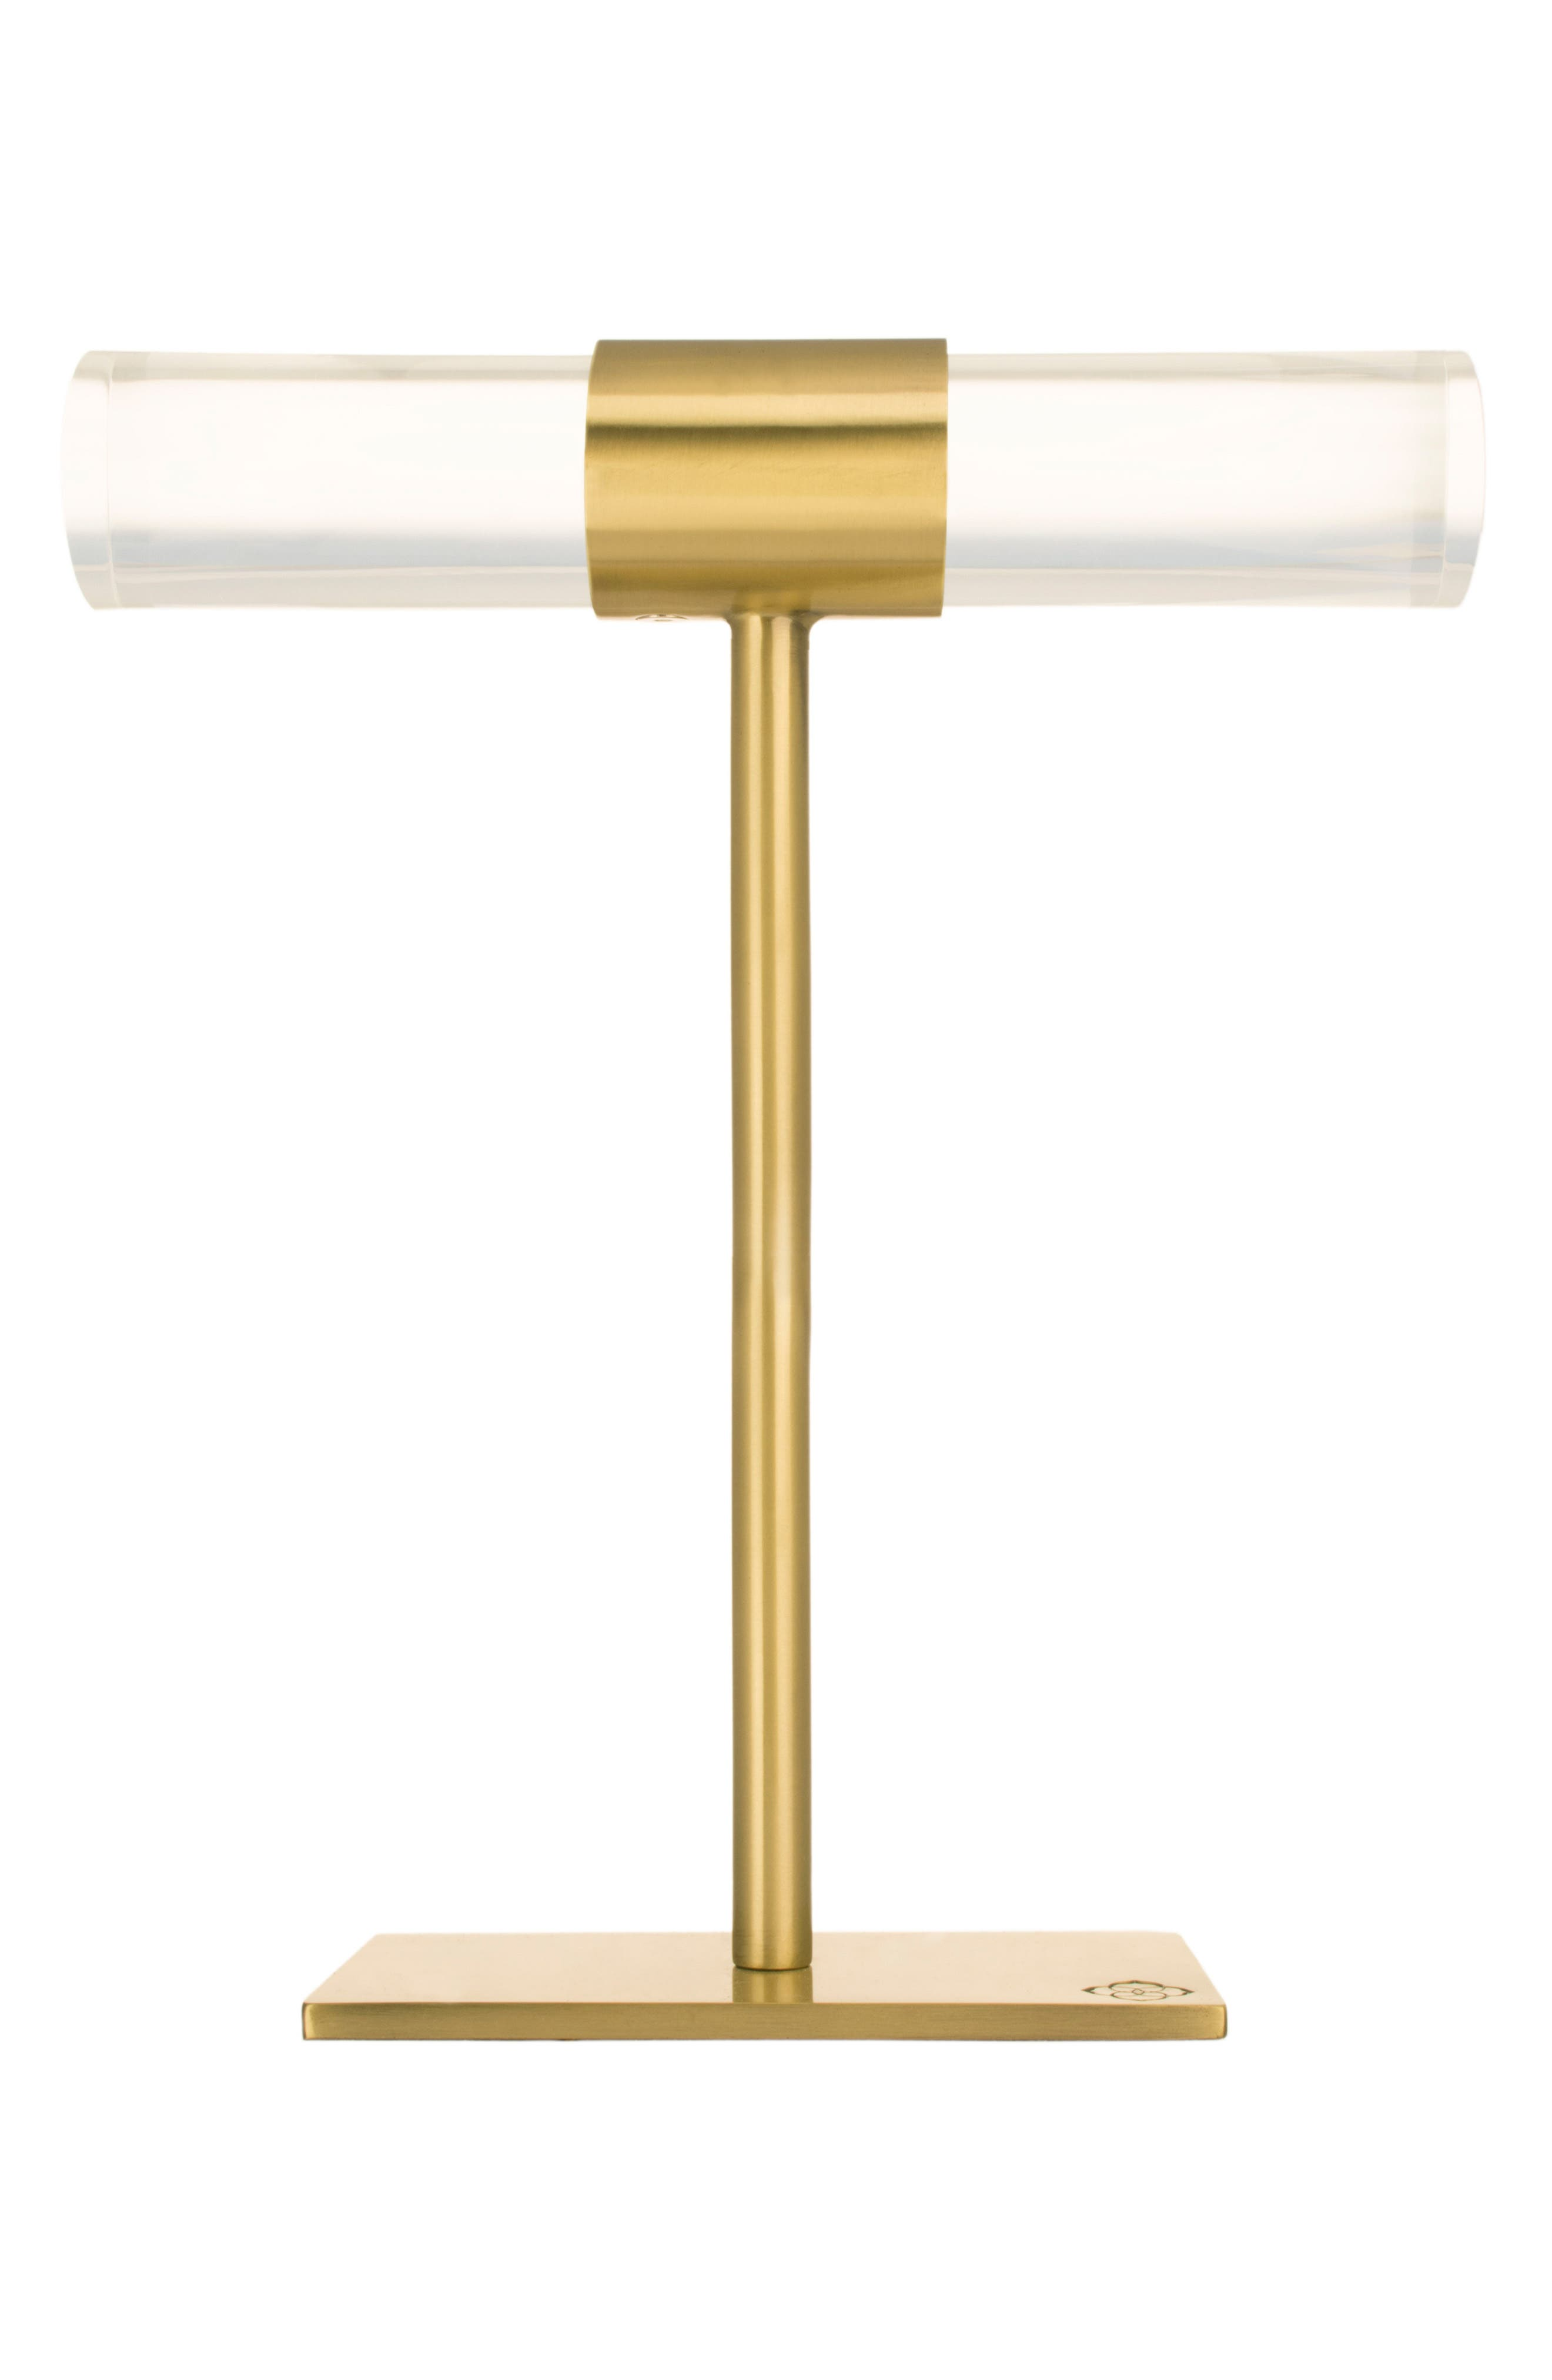 Kendra Scott Jewelry Stand